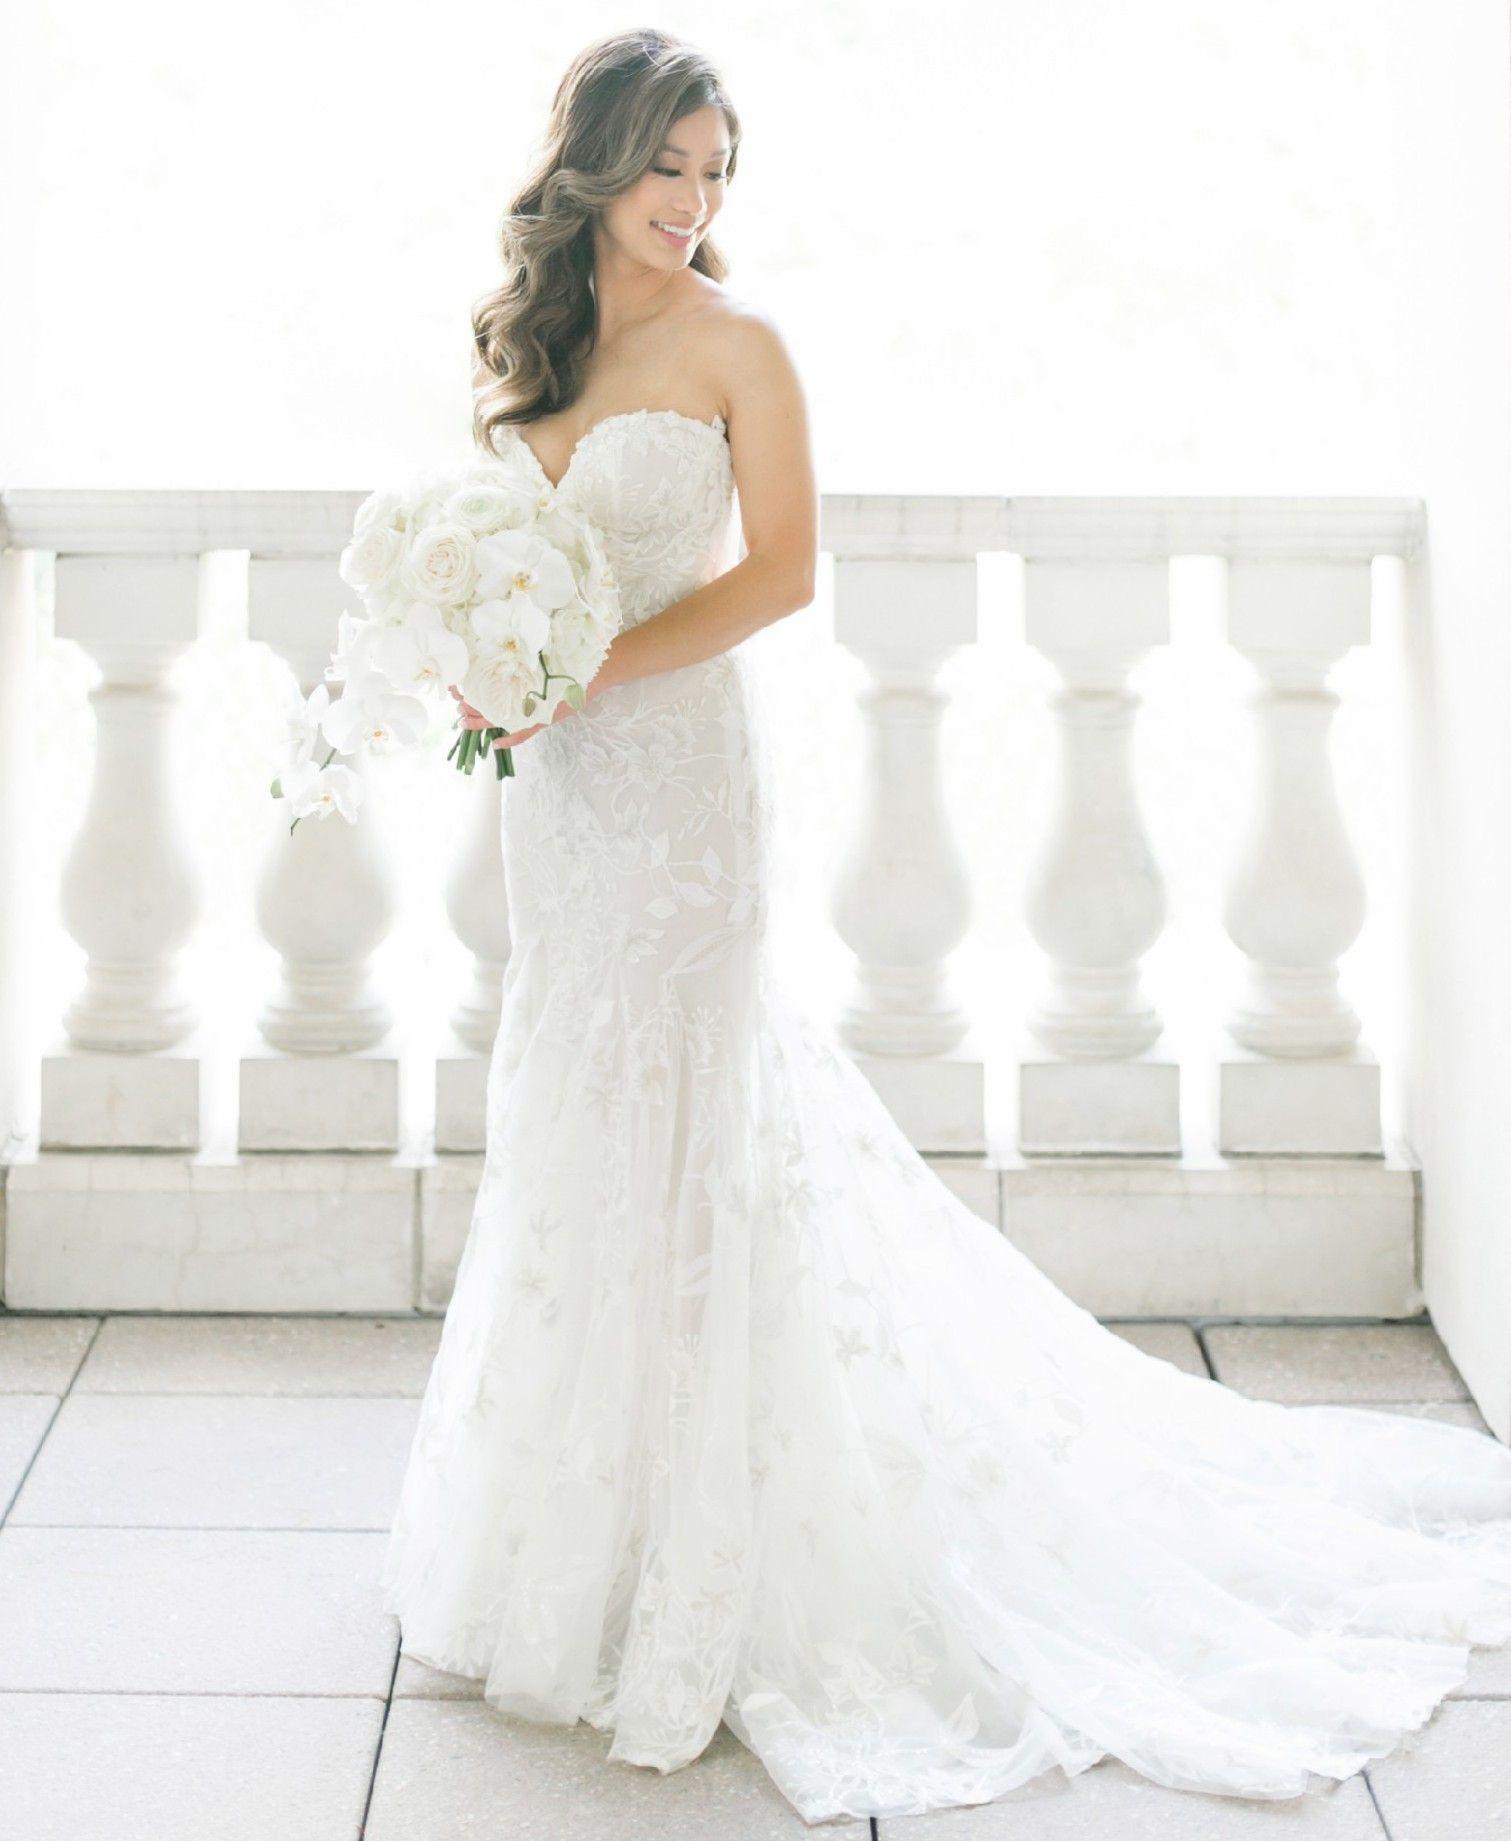 Galia Lahav G 302 Used Wedding Dress Save 36 Used Wedding Dresses Wedding Dresses Dresses [ 1841 x 1511 Pixel ]